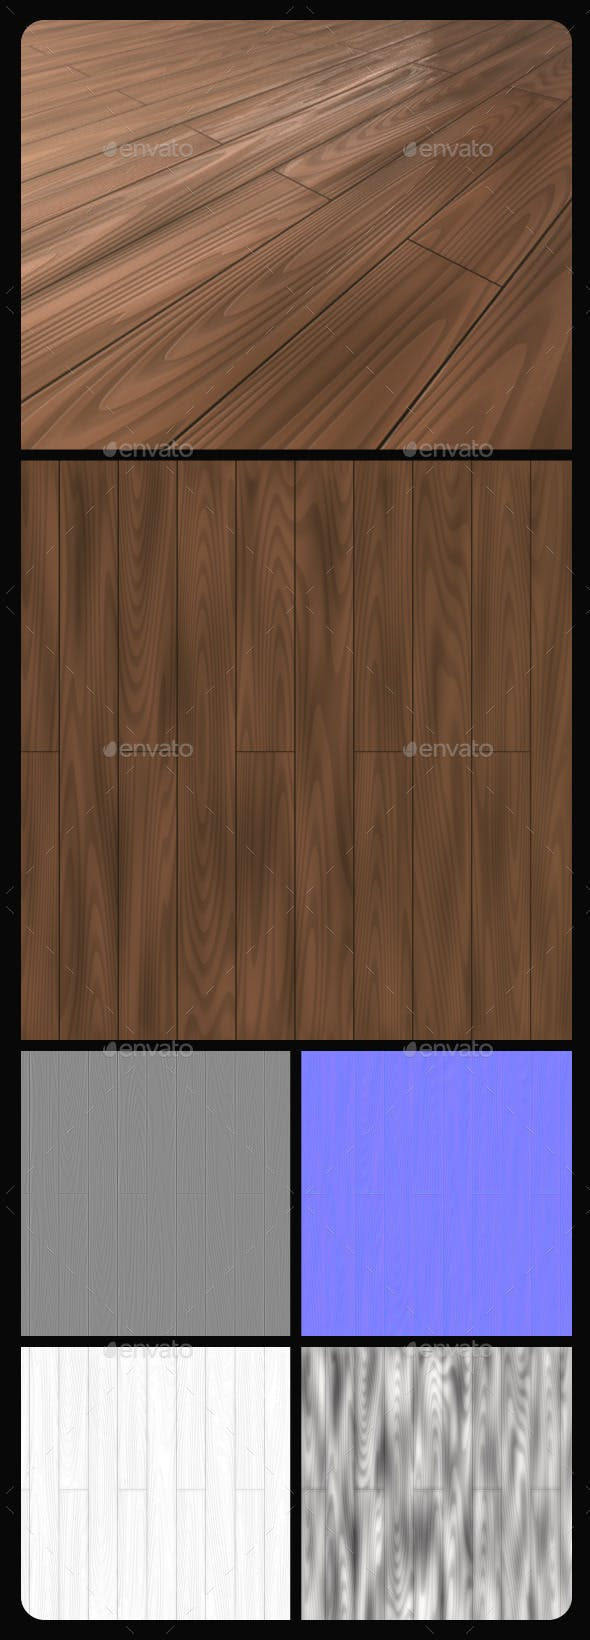 Wood Planks Tile Texture - 3DOcean Item for Sale